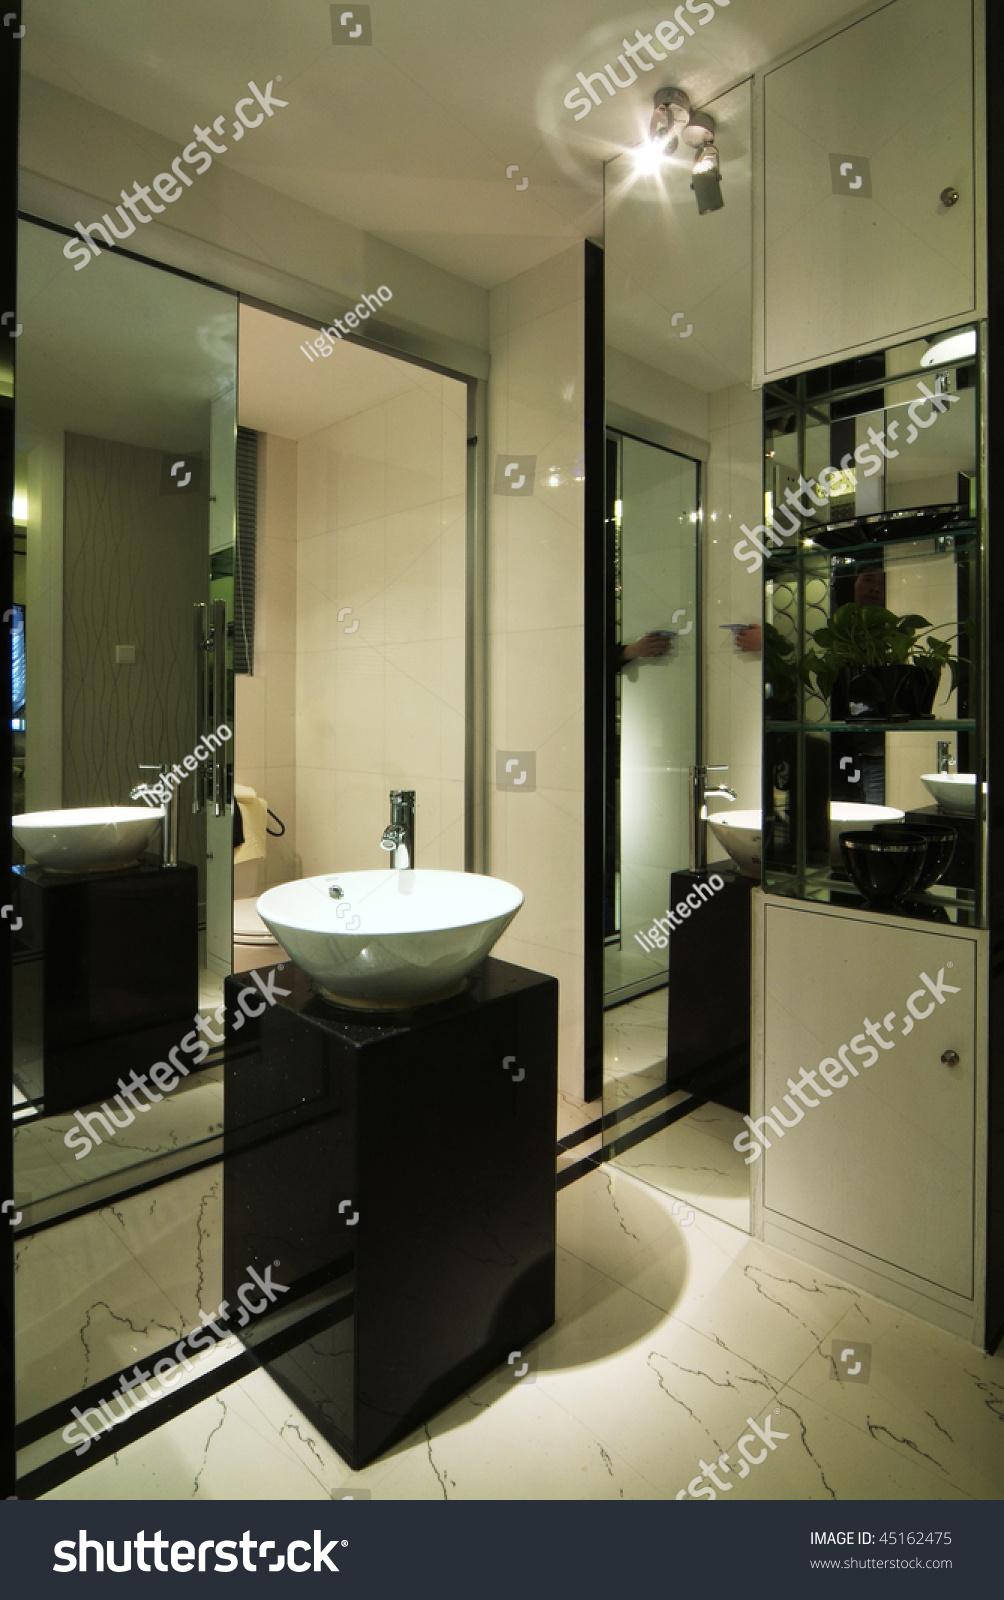 A Washroom In Modern Style. Stock Photo 45162475 : Shutterstock